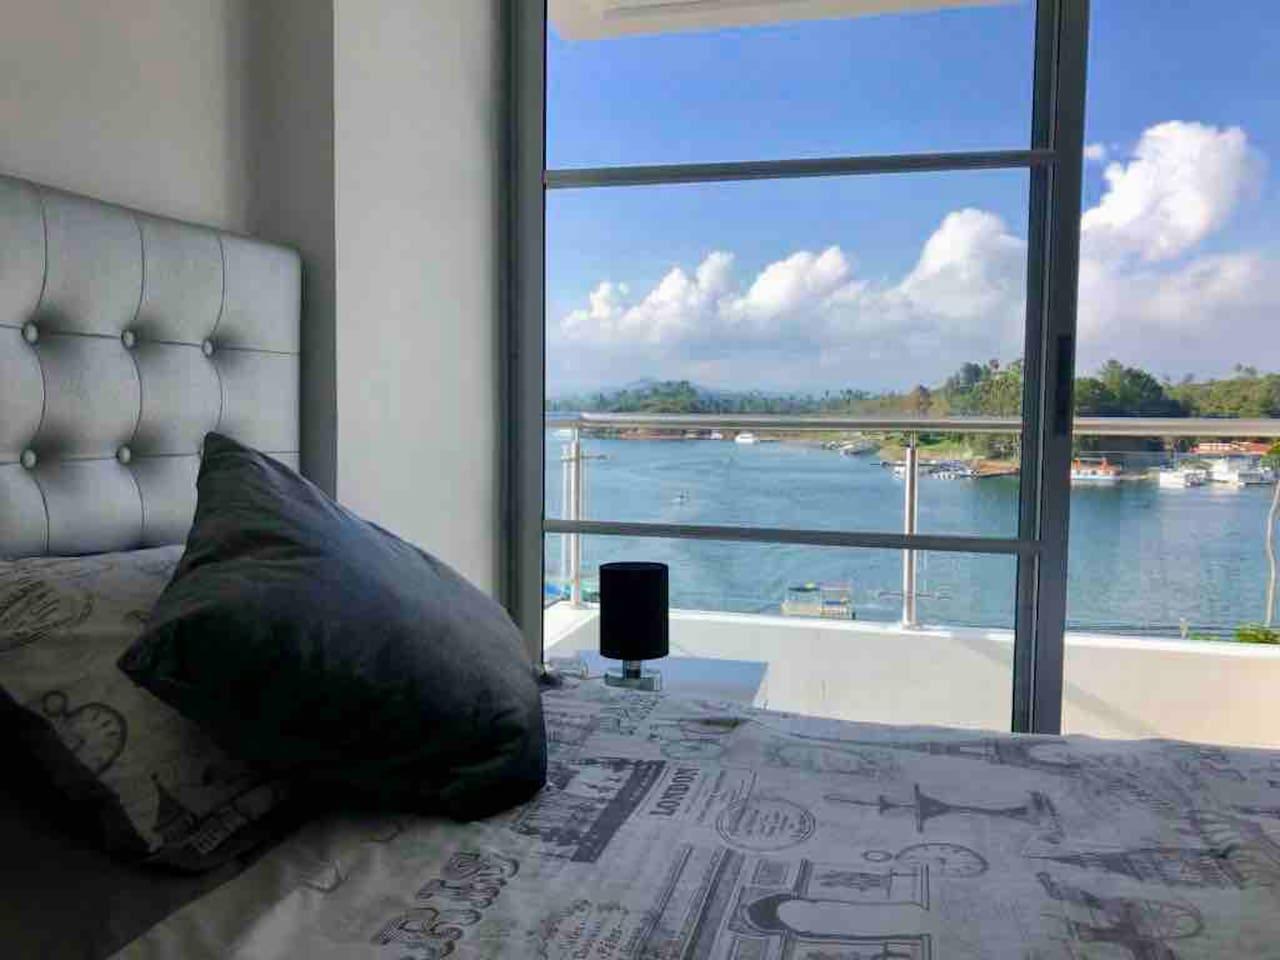 Apartamento Duplex con doble balcón. Nivel 1: cocina, sala con amplio balcón y vista al lago, hamaca y barra. Nivel 2: alcoba principal con balcón, baño + vista al lago y una alcoba secundaria con baño.